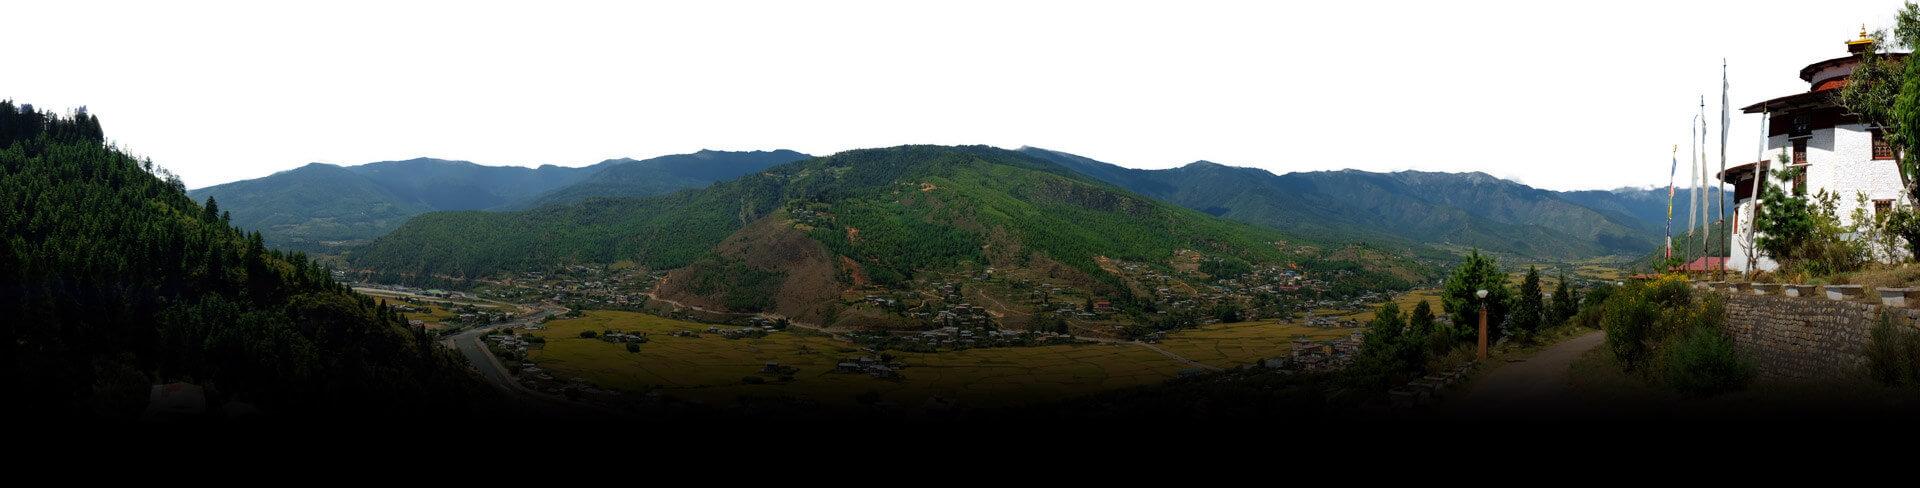 cme course bhutan fullpagebg1